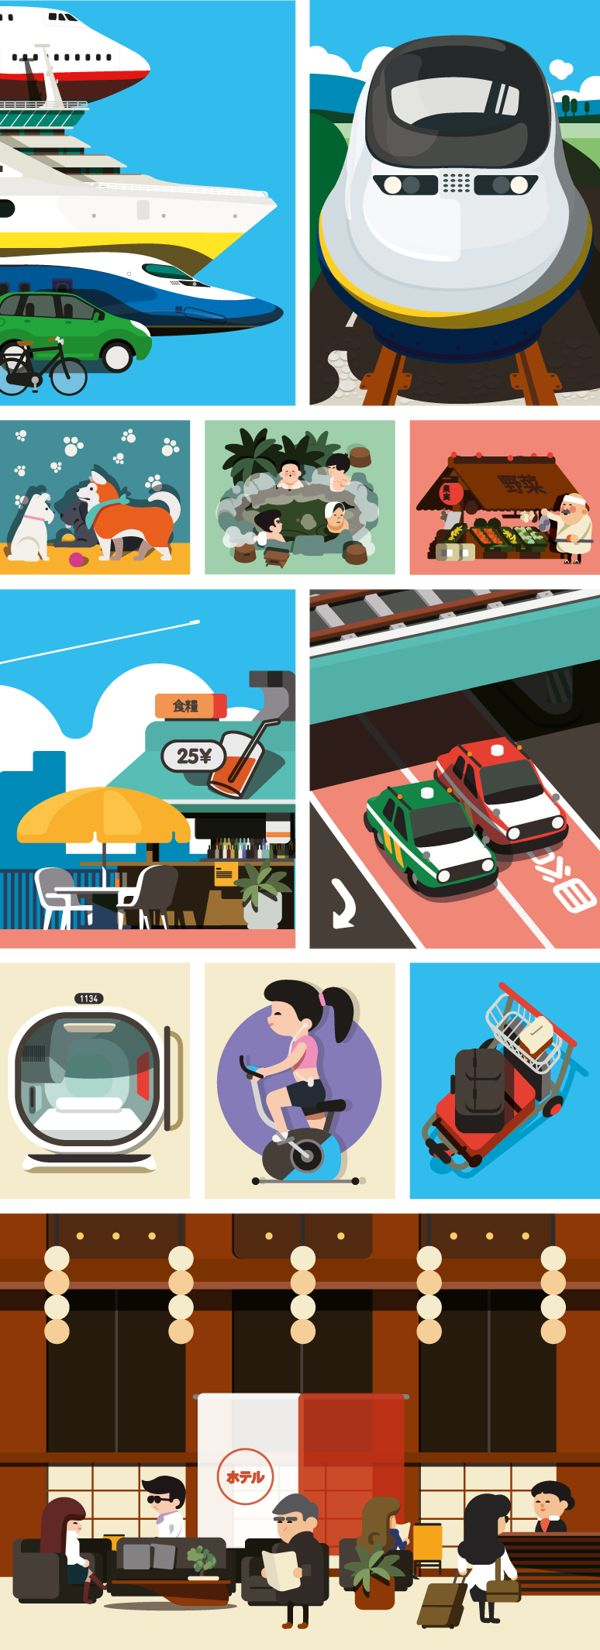 Monocle Train Station by Hey , via Behance